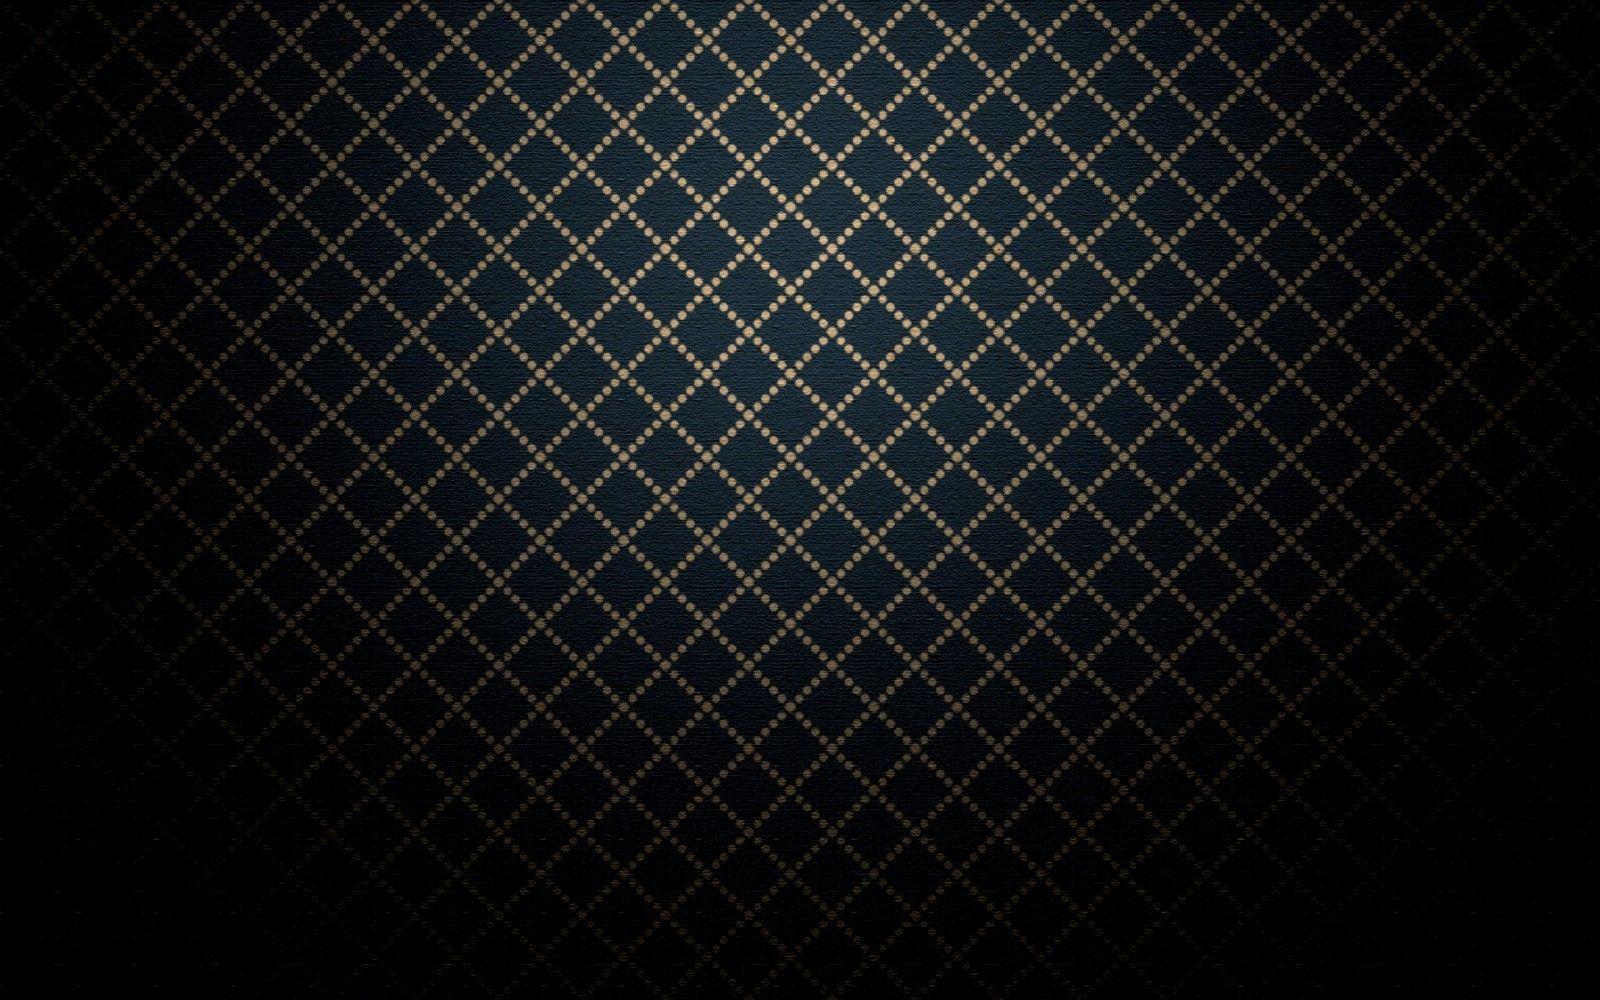 Background image black - Black Texture Hd Desktop Wallpaper High Definition Fullscreen